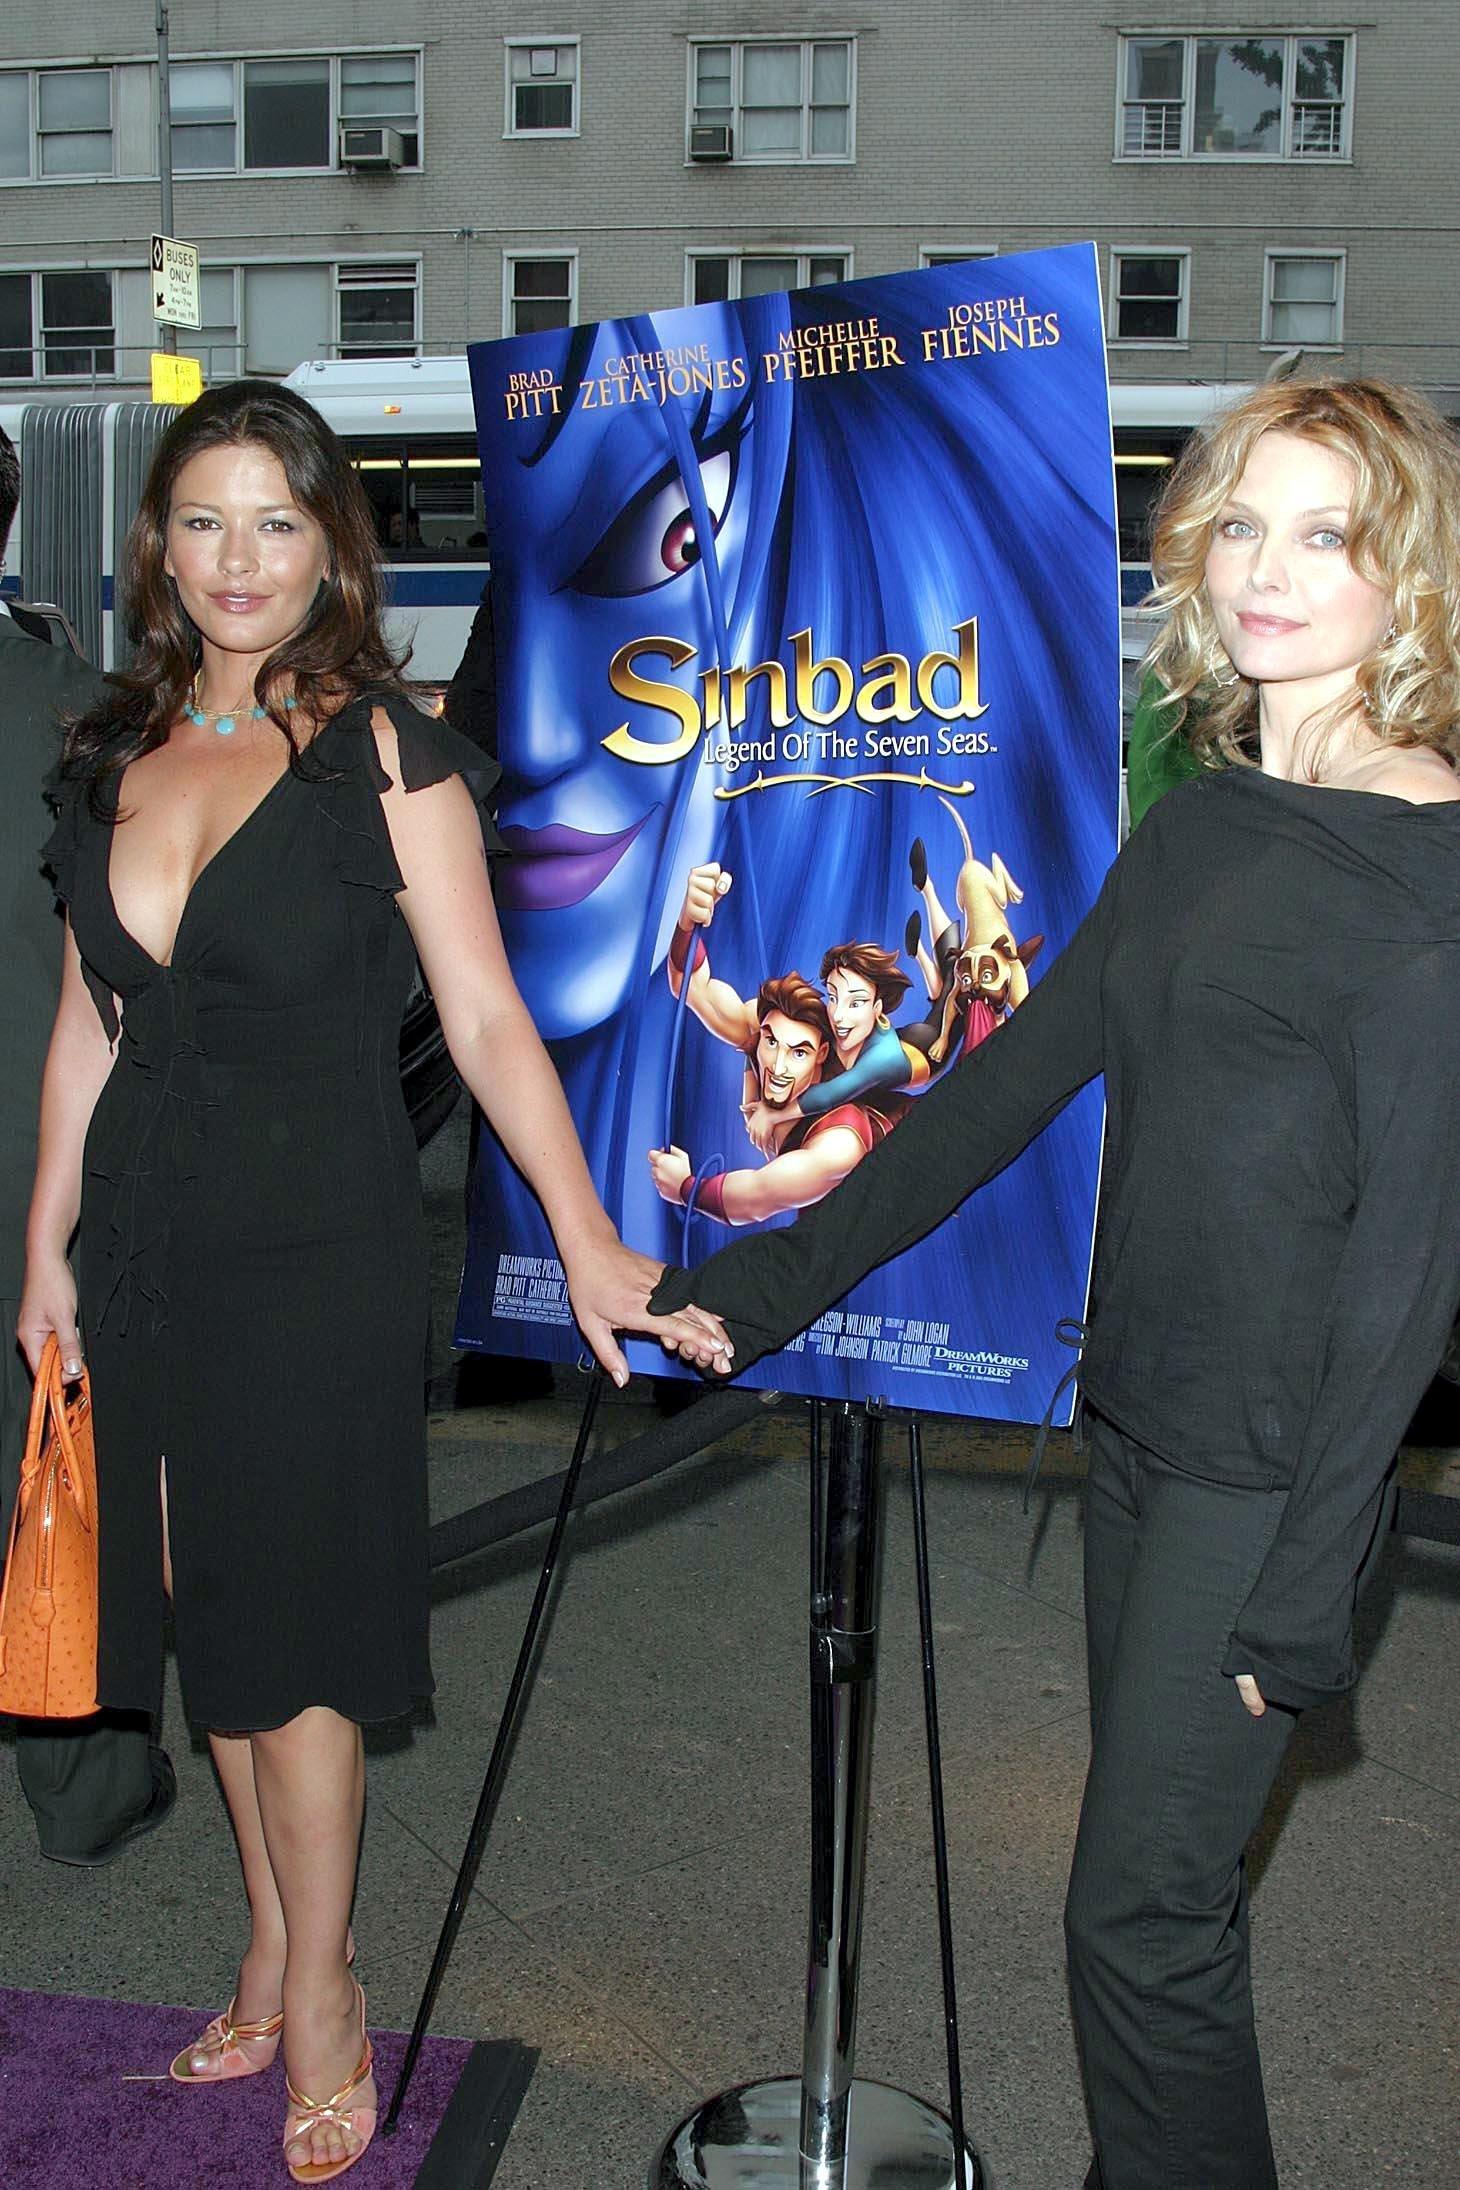 Catherine Zeta Jones and Michelle Pfeiffer